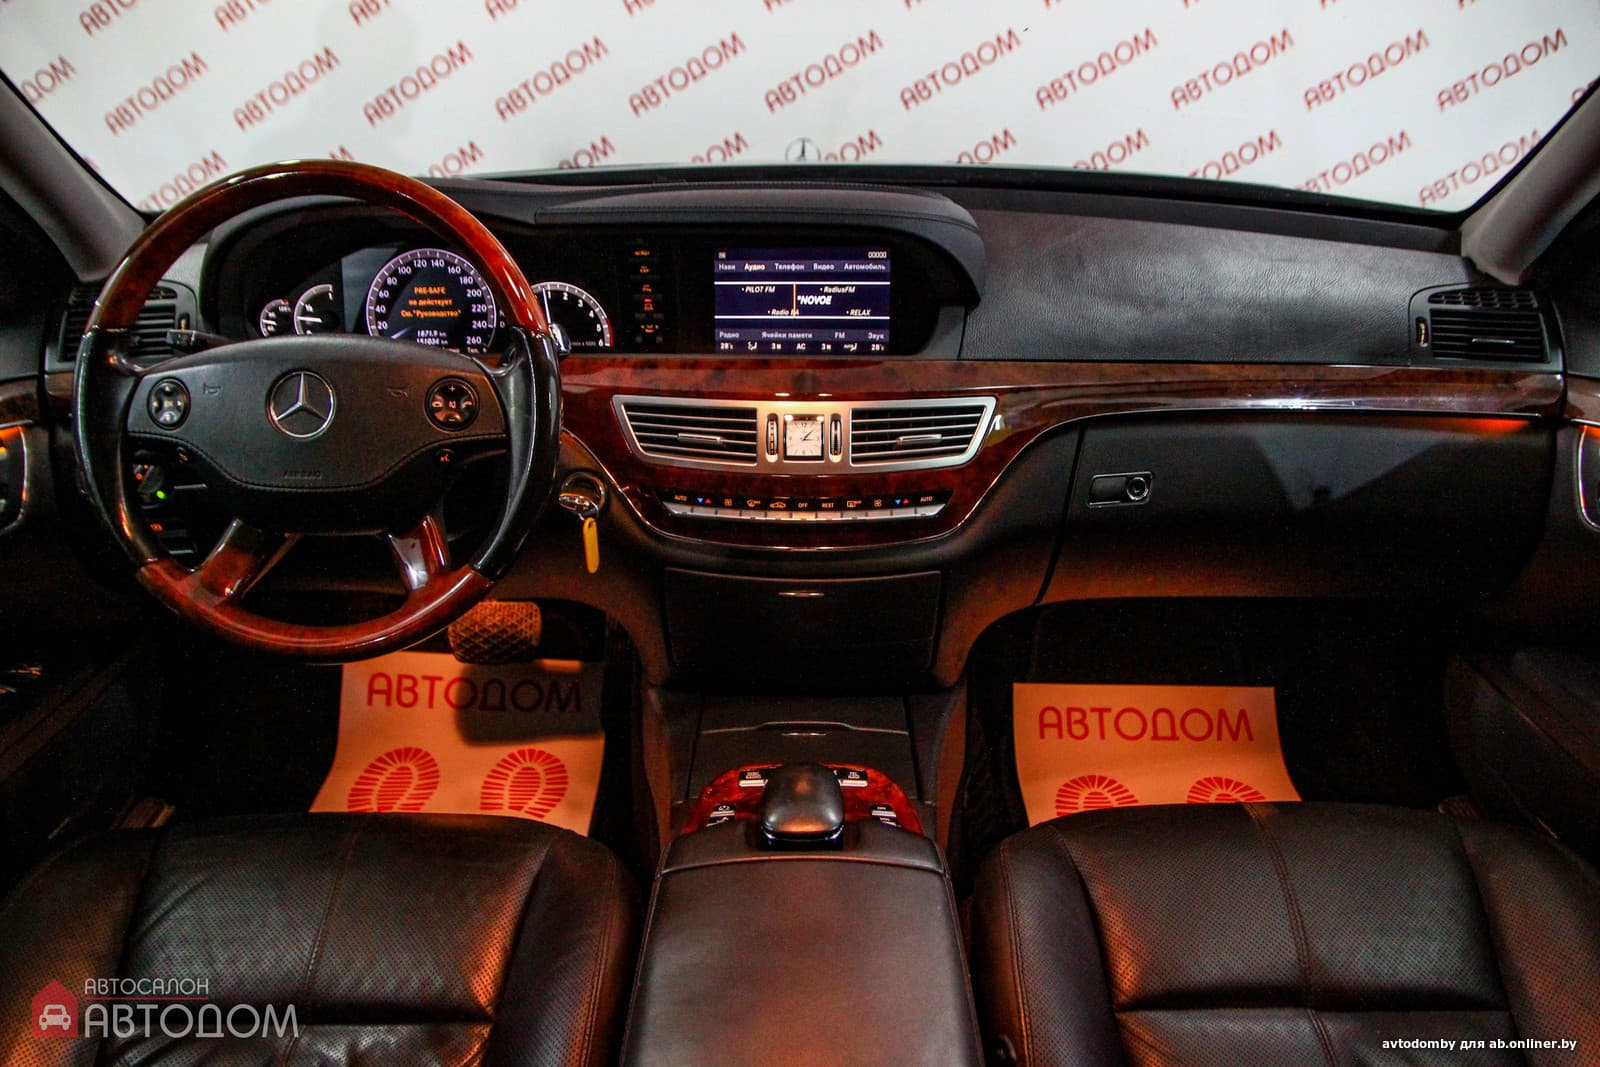 Mercedes-Benz S500 S320 CDI